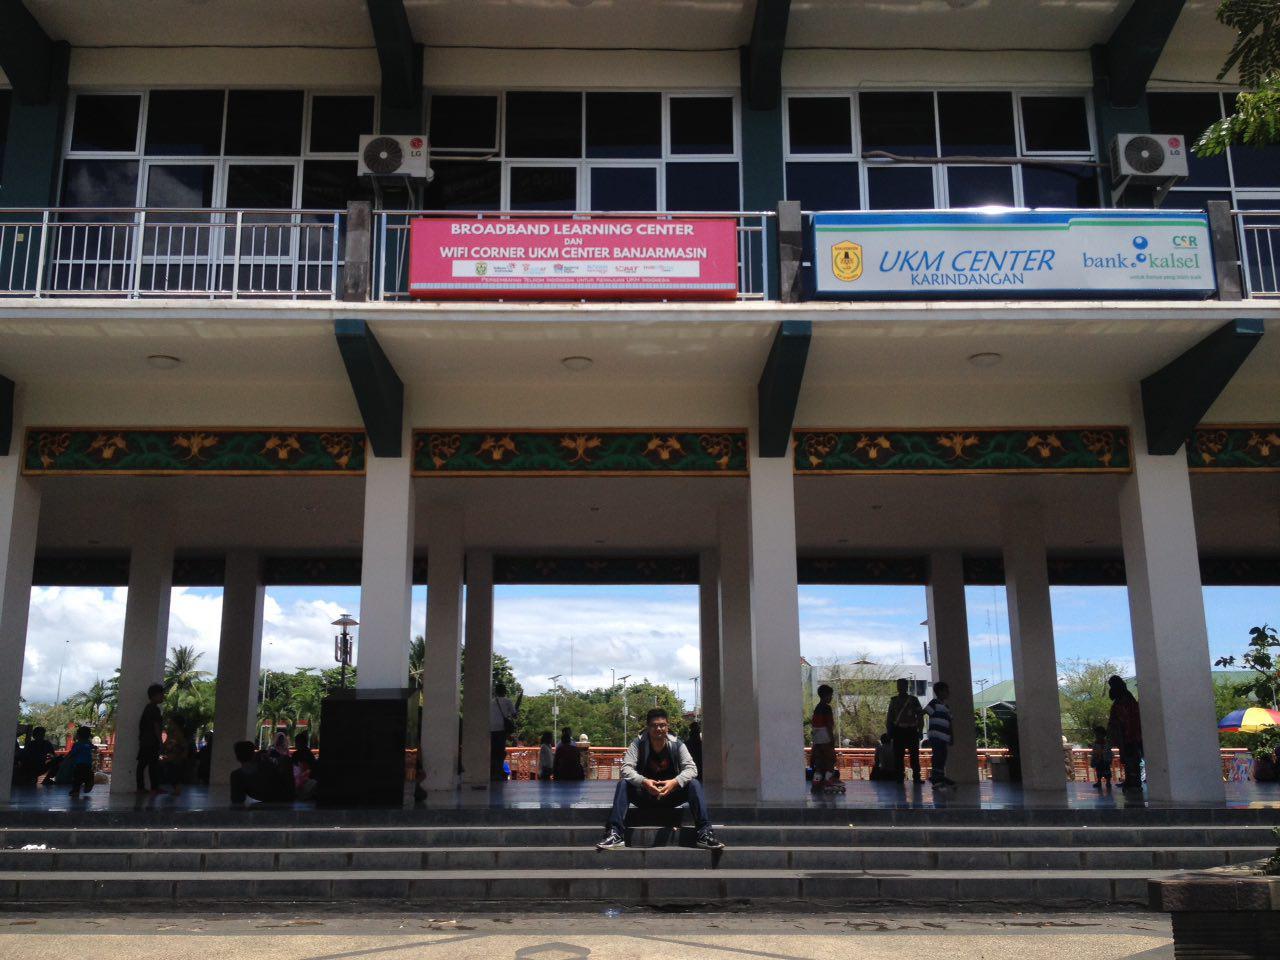 Tempat Wisata Banjarmasin Museum Wasaka Singkatan Waja Sampai Kaputing Motto